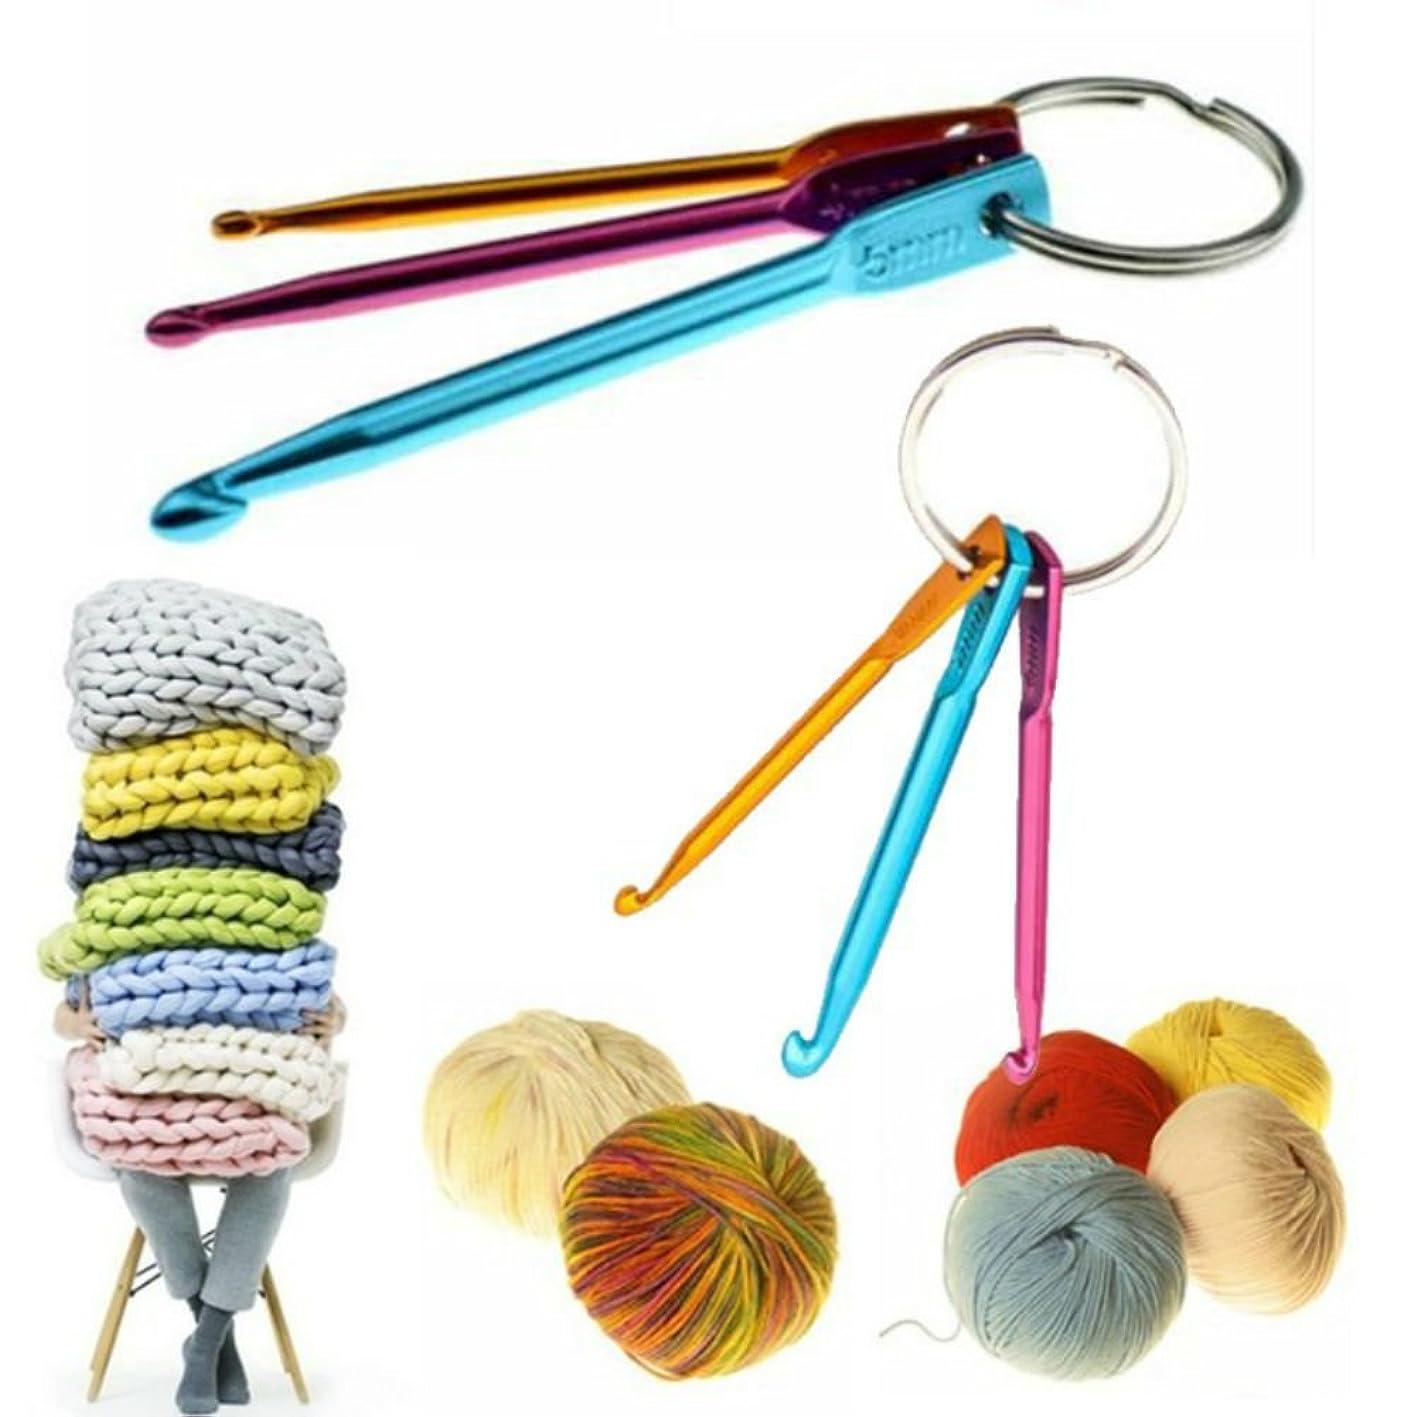 AKOAK 2 Set 6 Pieces Mini Keychain Aluminum Crochet Hooks Sweater Knitting Needles Tool(3mm&4mm&5mm) euqwjbfngnh139